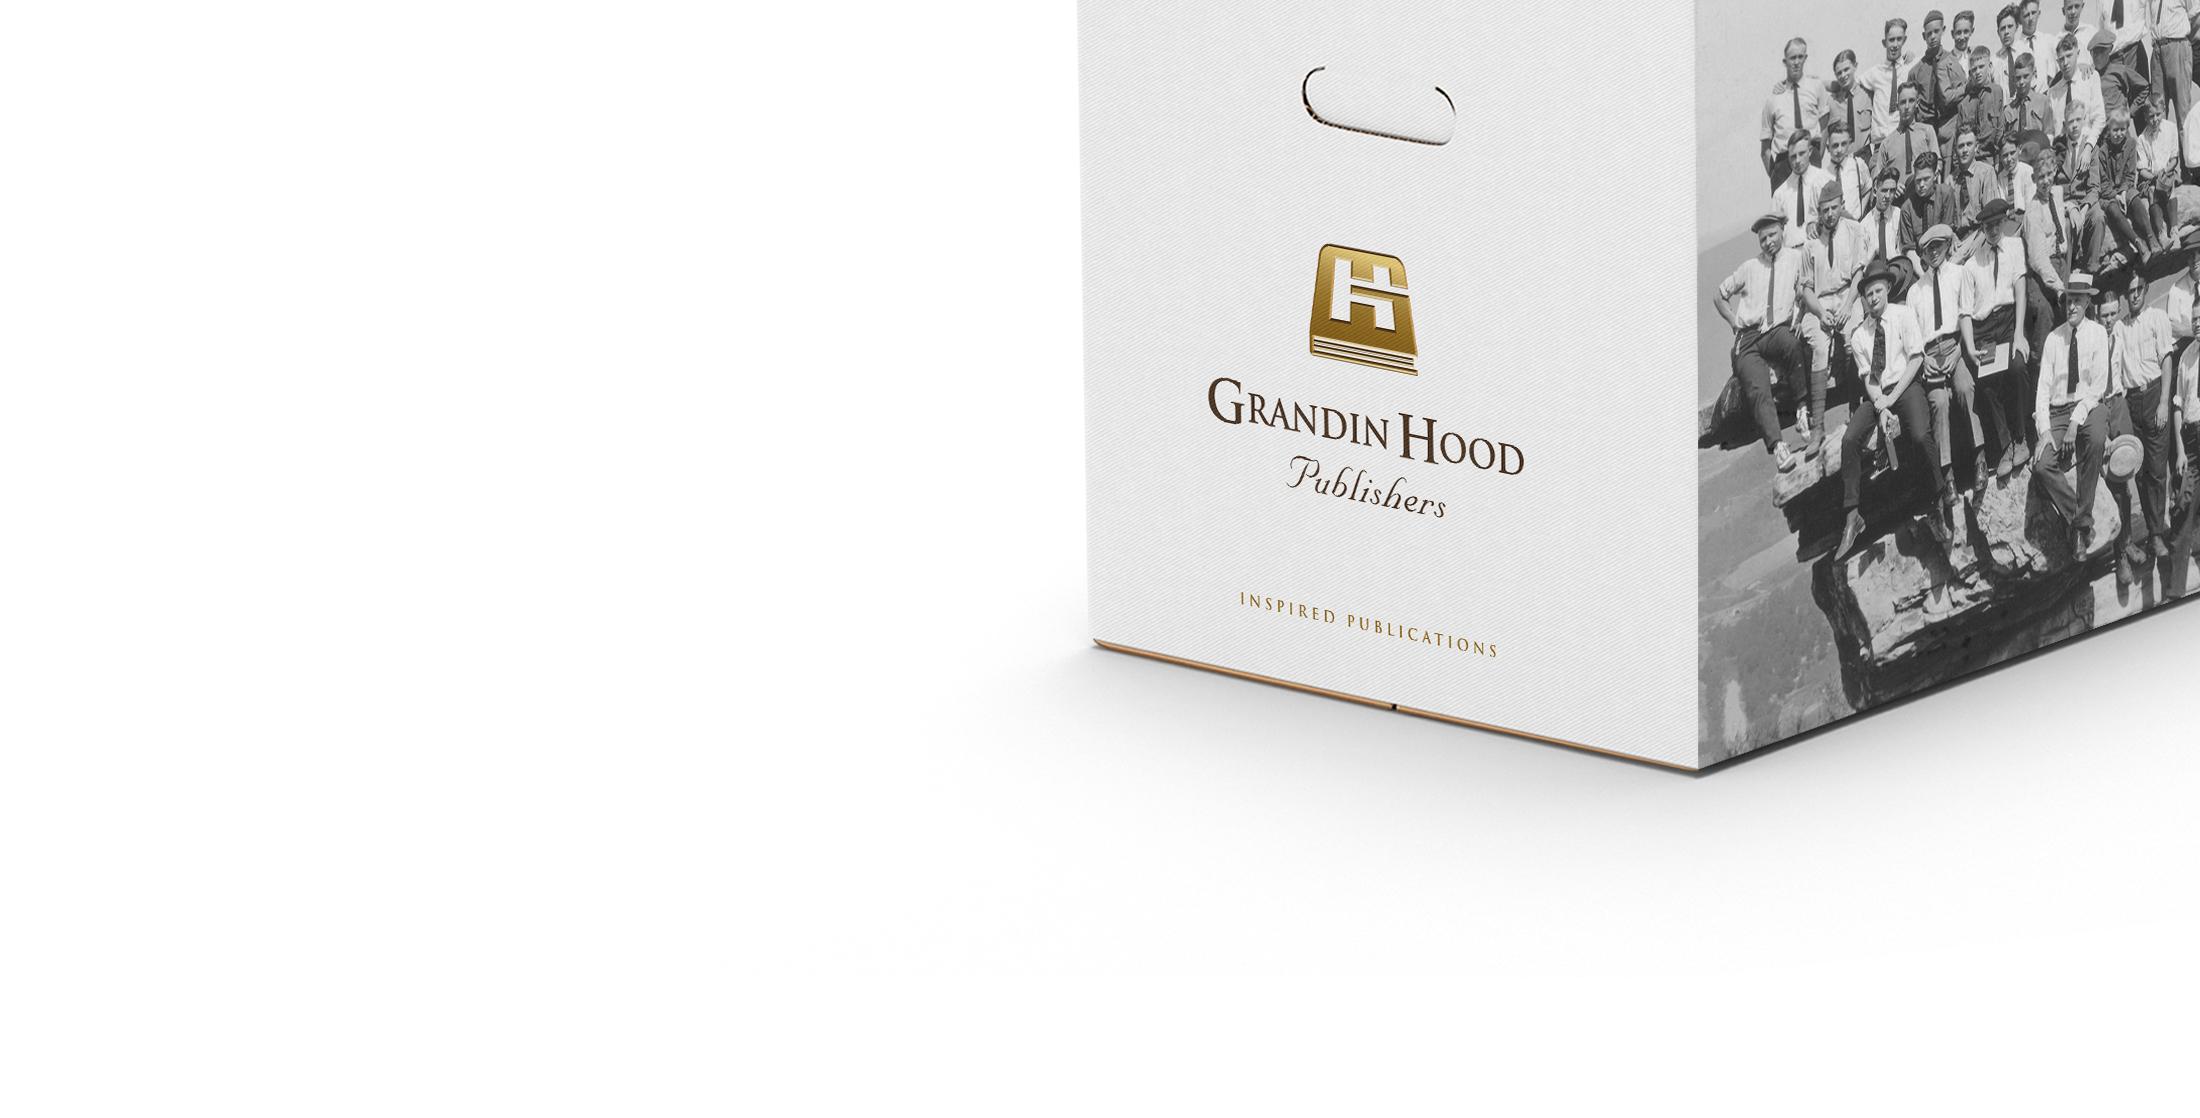 Grandin Hood Package Design © Robertson Design